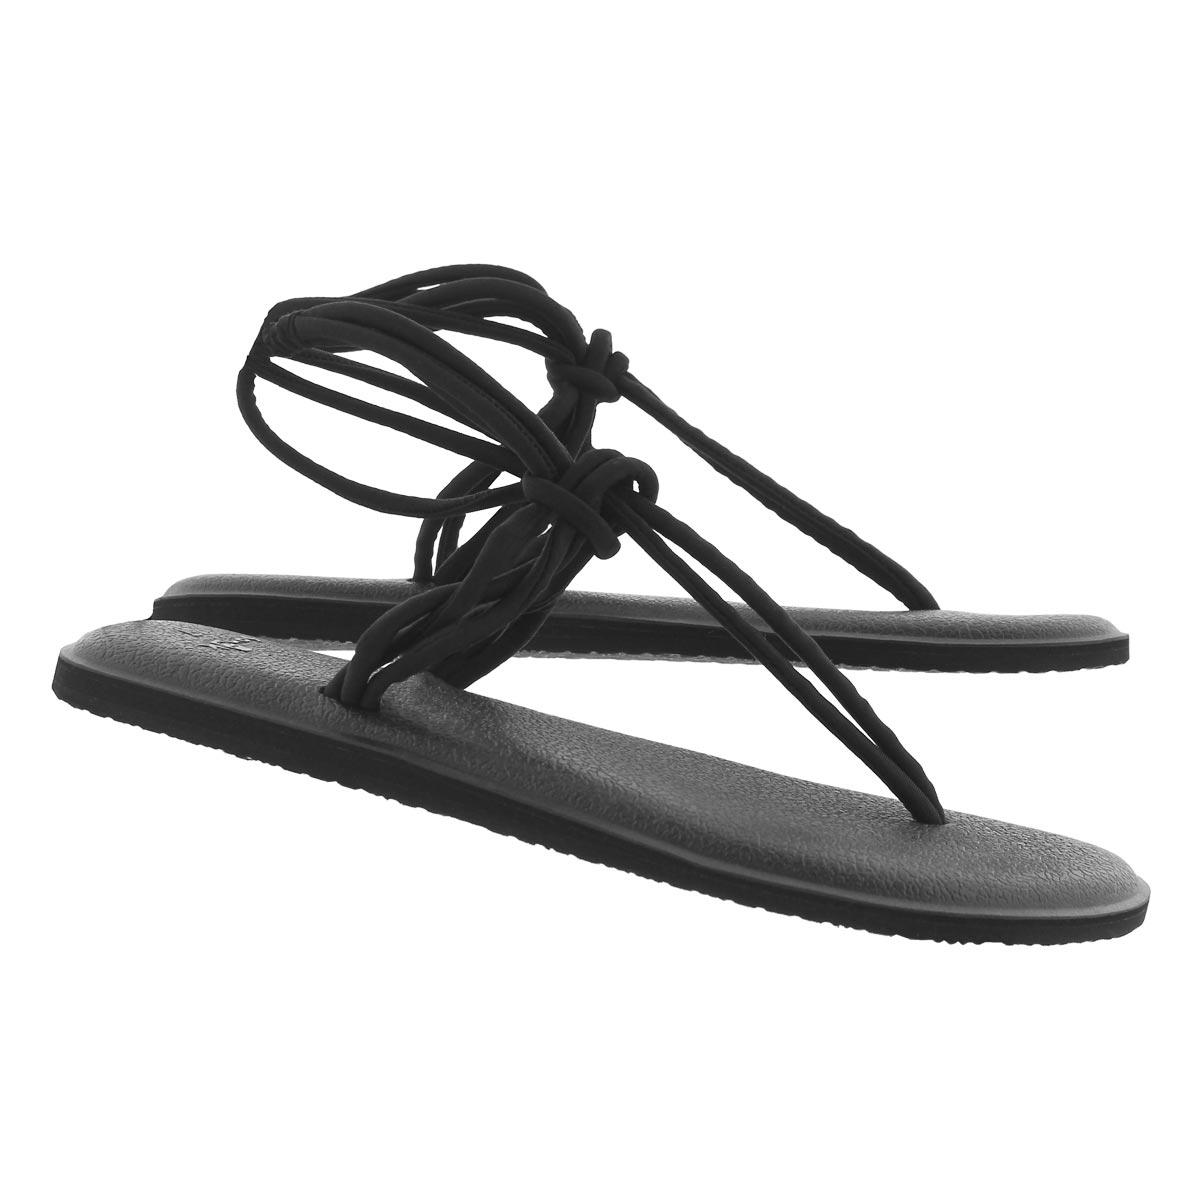 Women's YOGA SUNSHINE black thong sandals